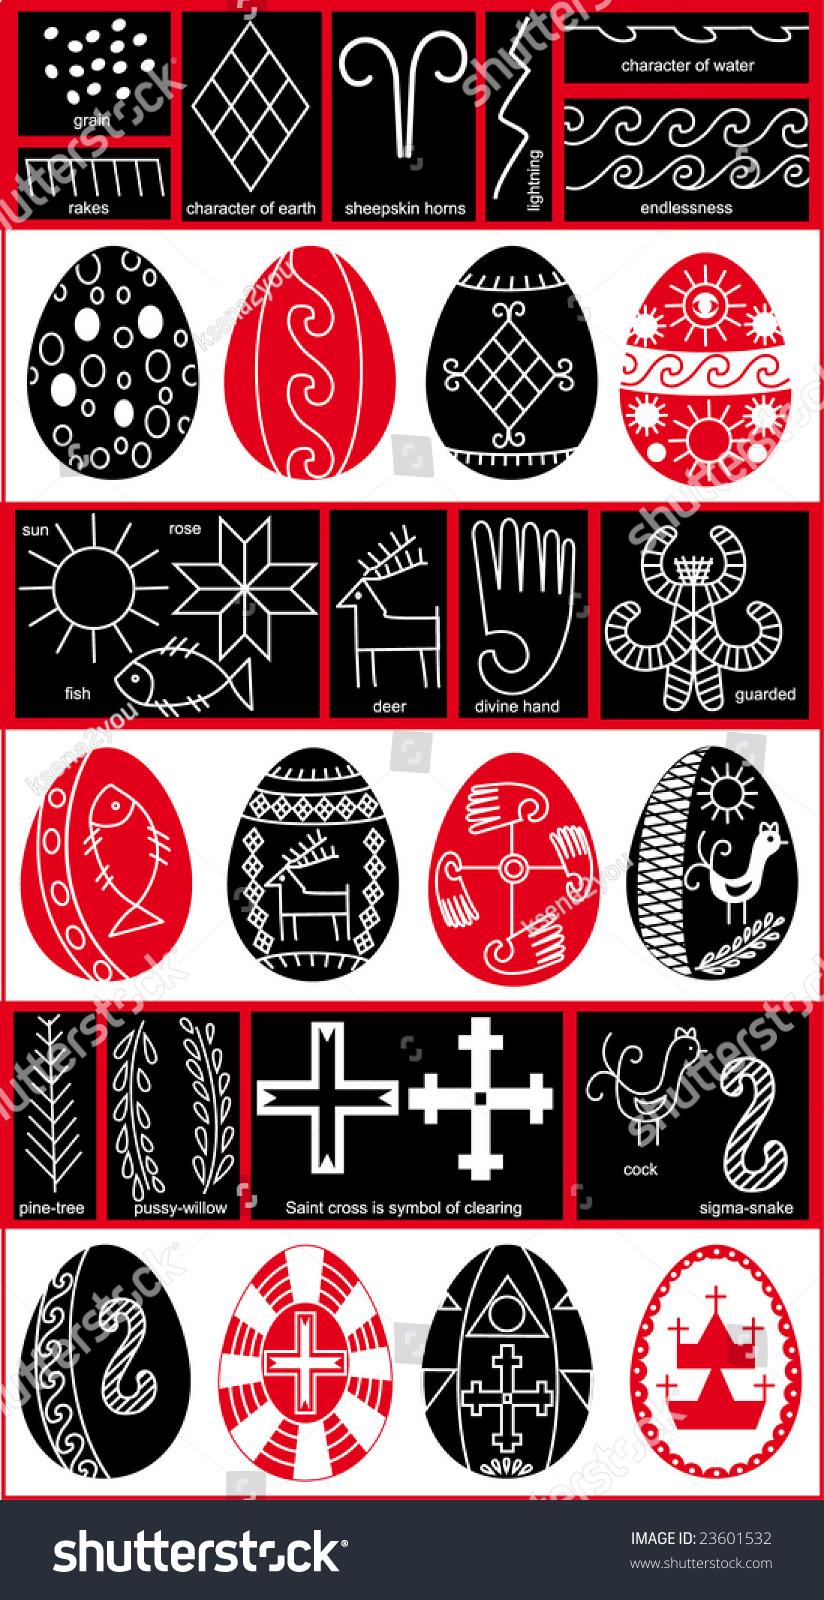 Christian symbols on easter eggs stock vector 23601532 shutterstock christian symbols on easter eggs biocorpaavc